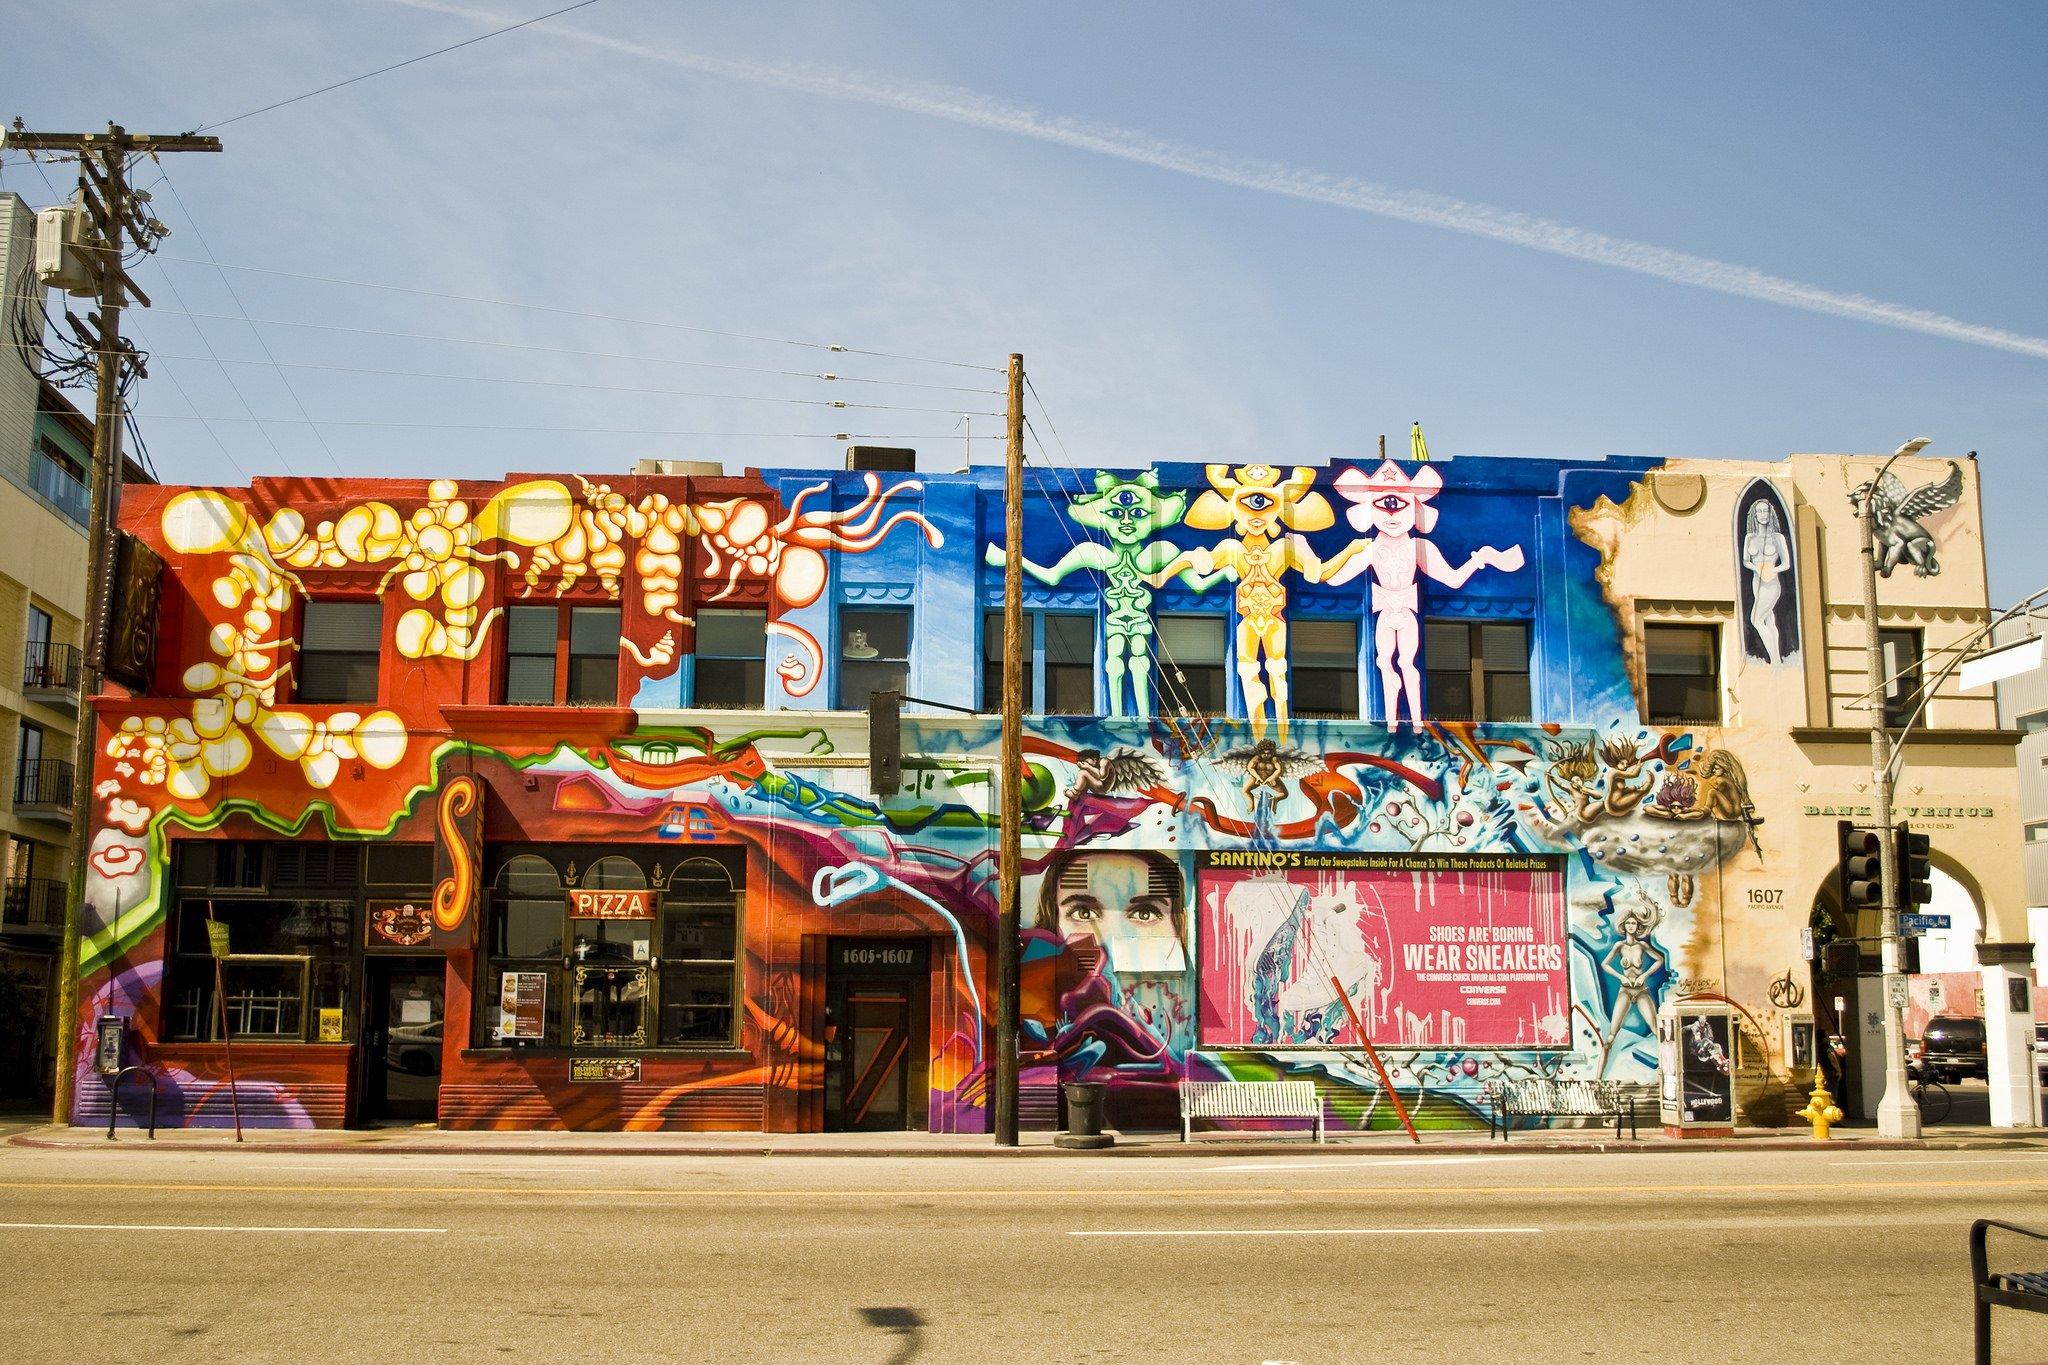 3d Street Art Graffiti Wallpaper Graffiti City Wallpapers Hd Download Free Pixelstalk Net